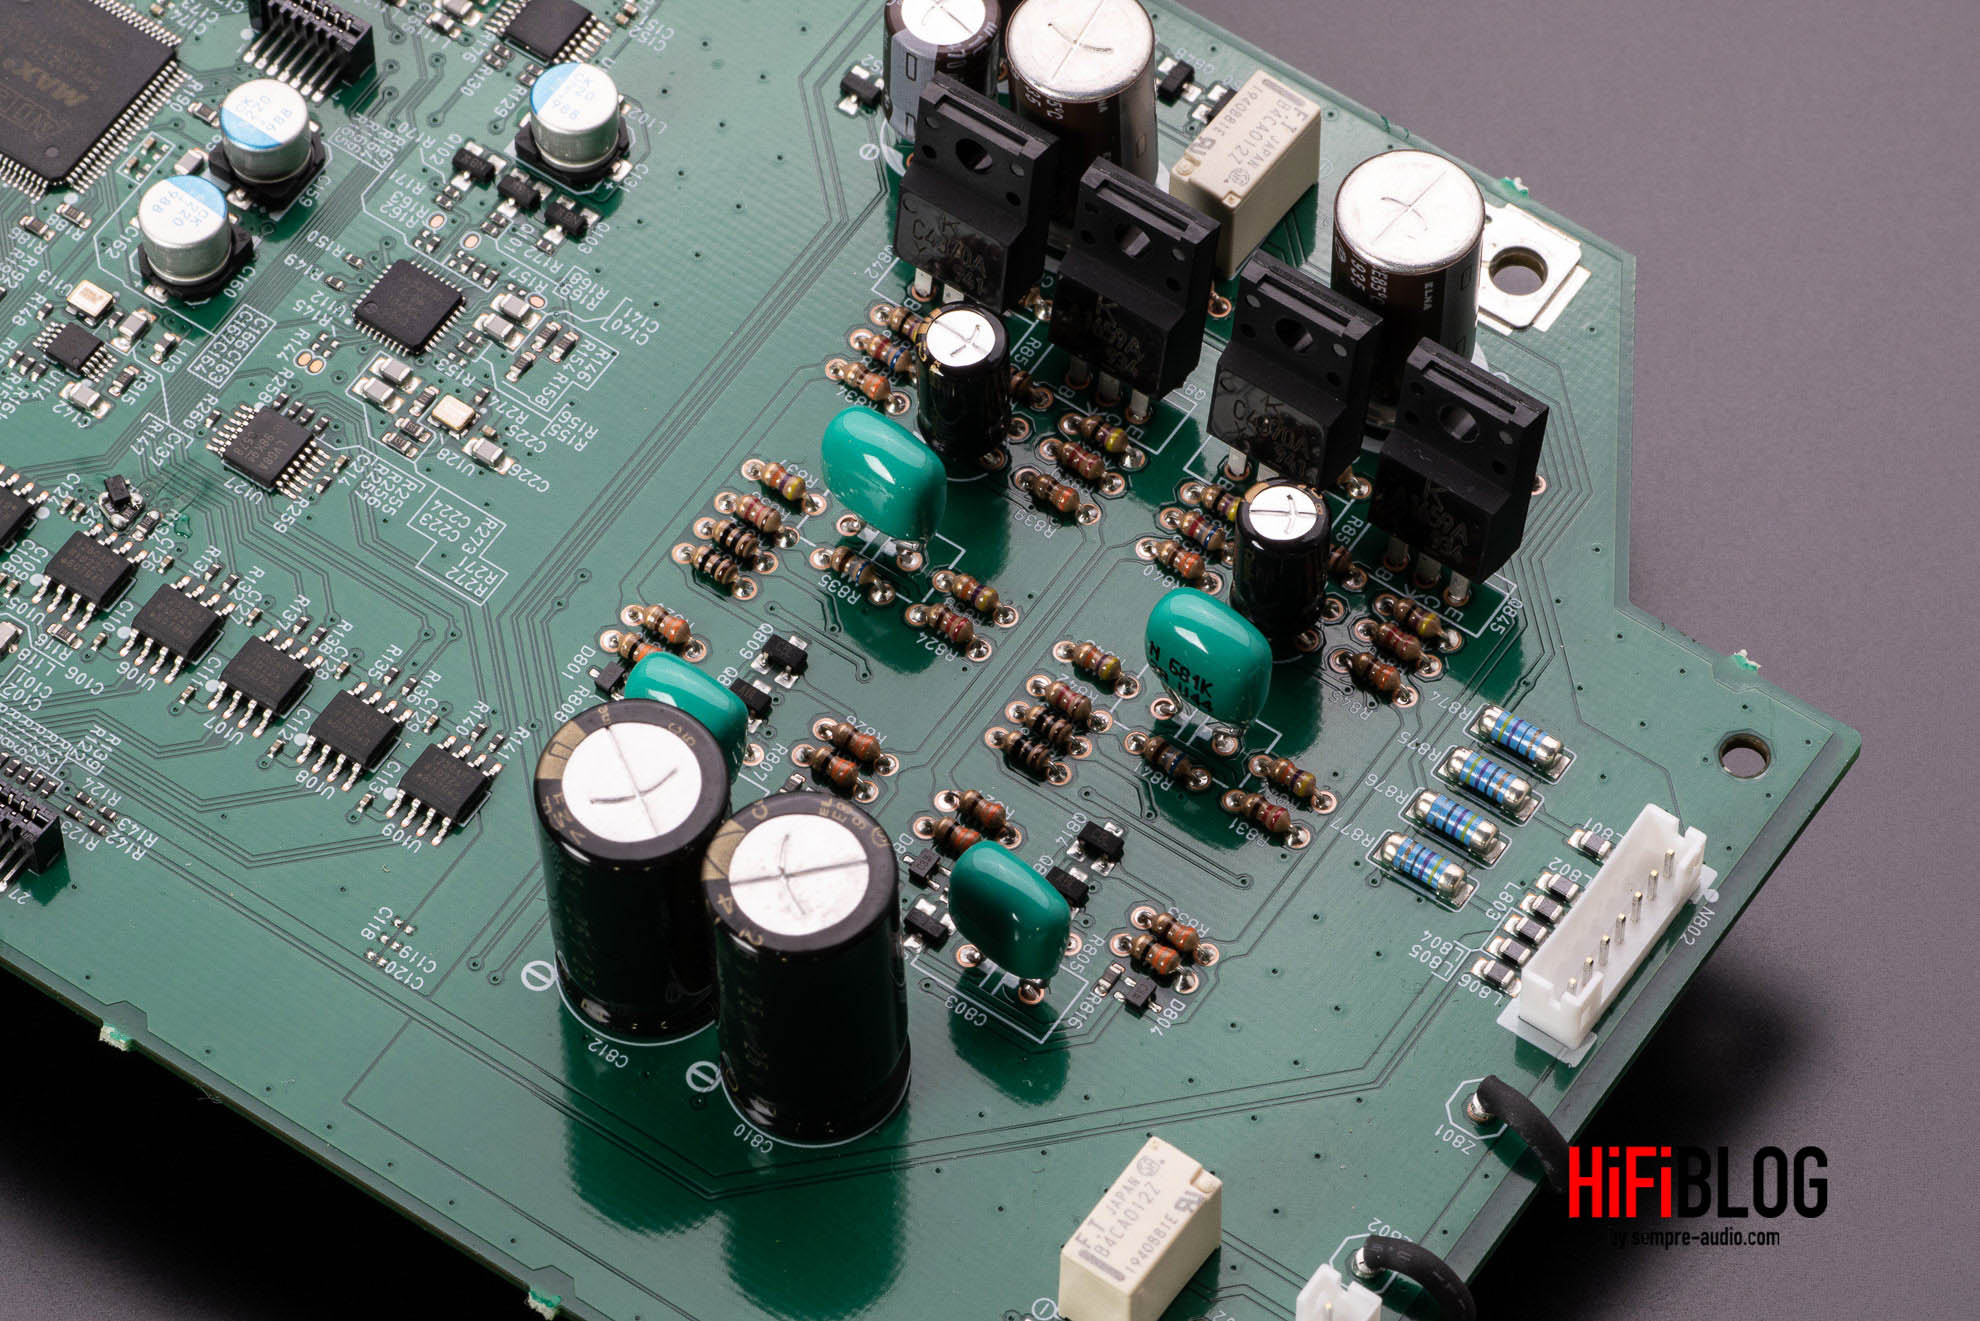 Marantz Model 30 Integrated Amplifier and SACD 30n Network SACD Player 68